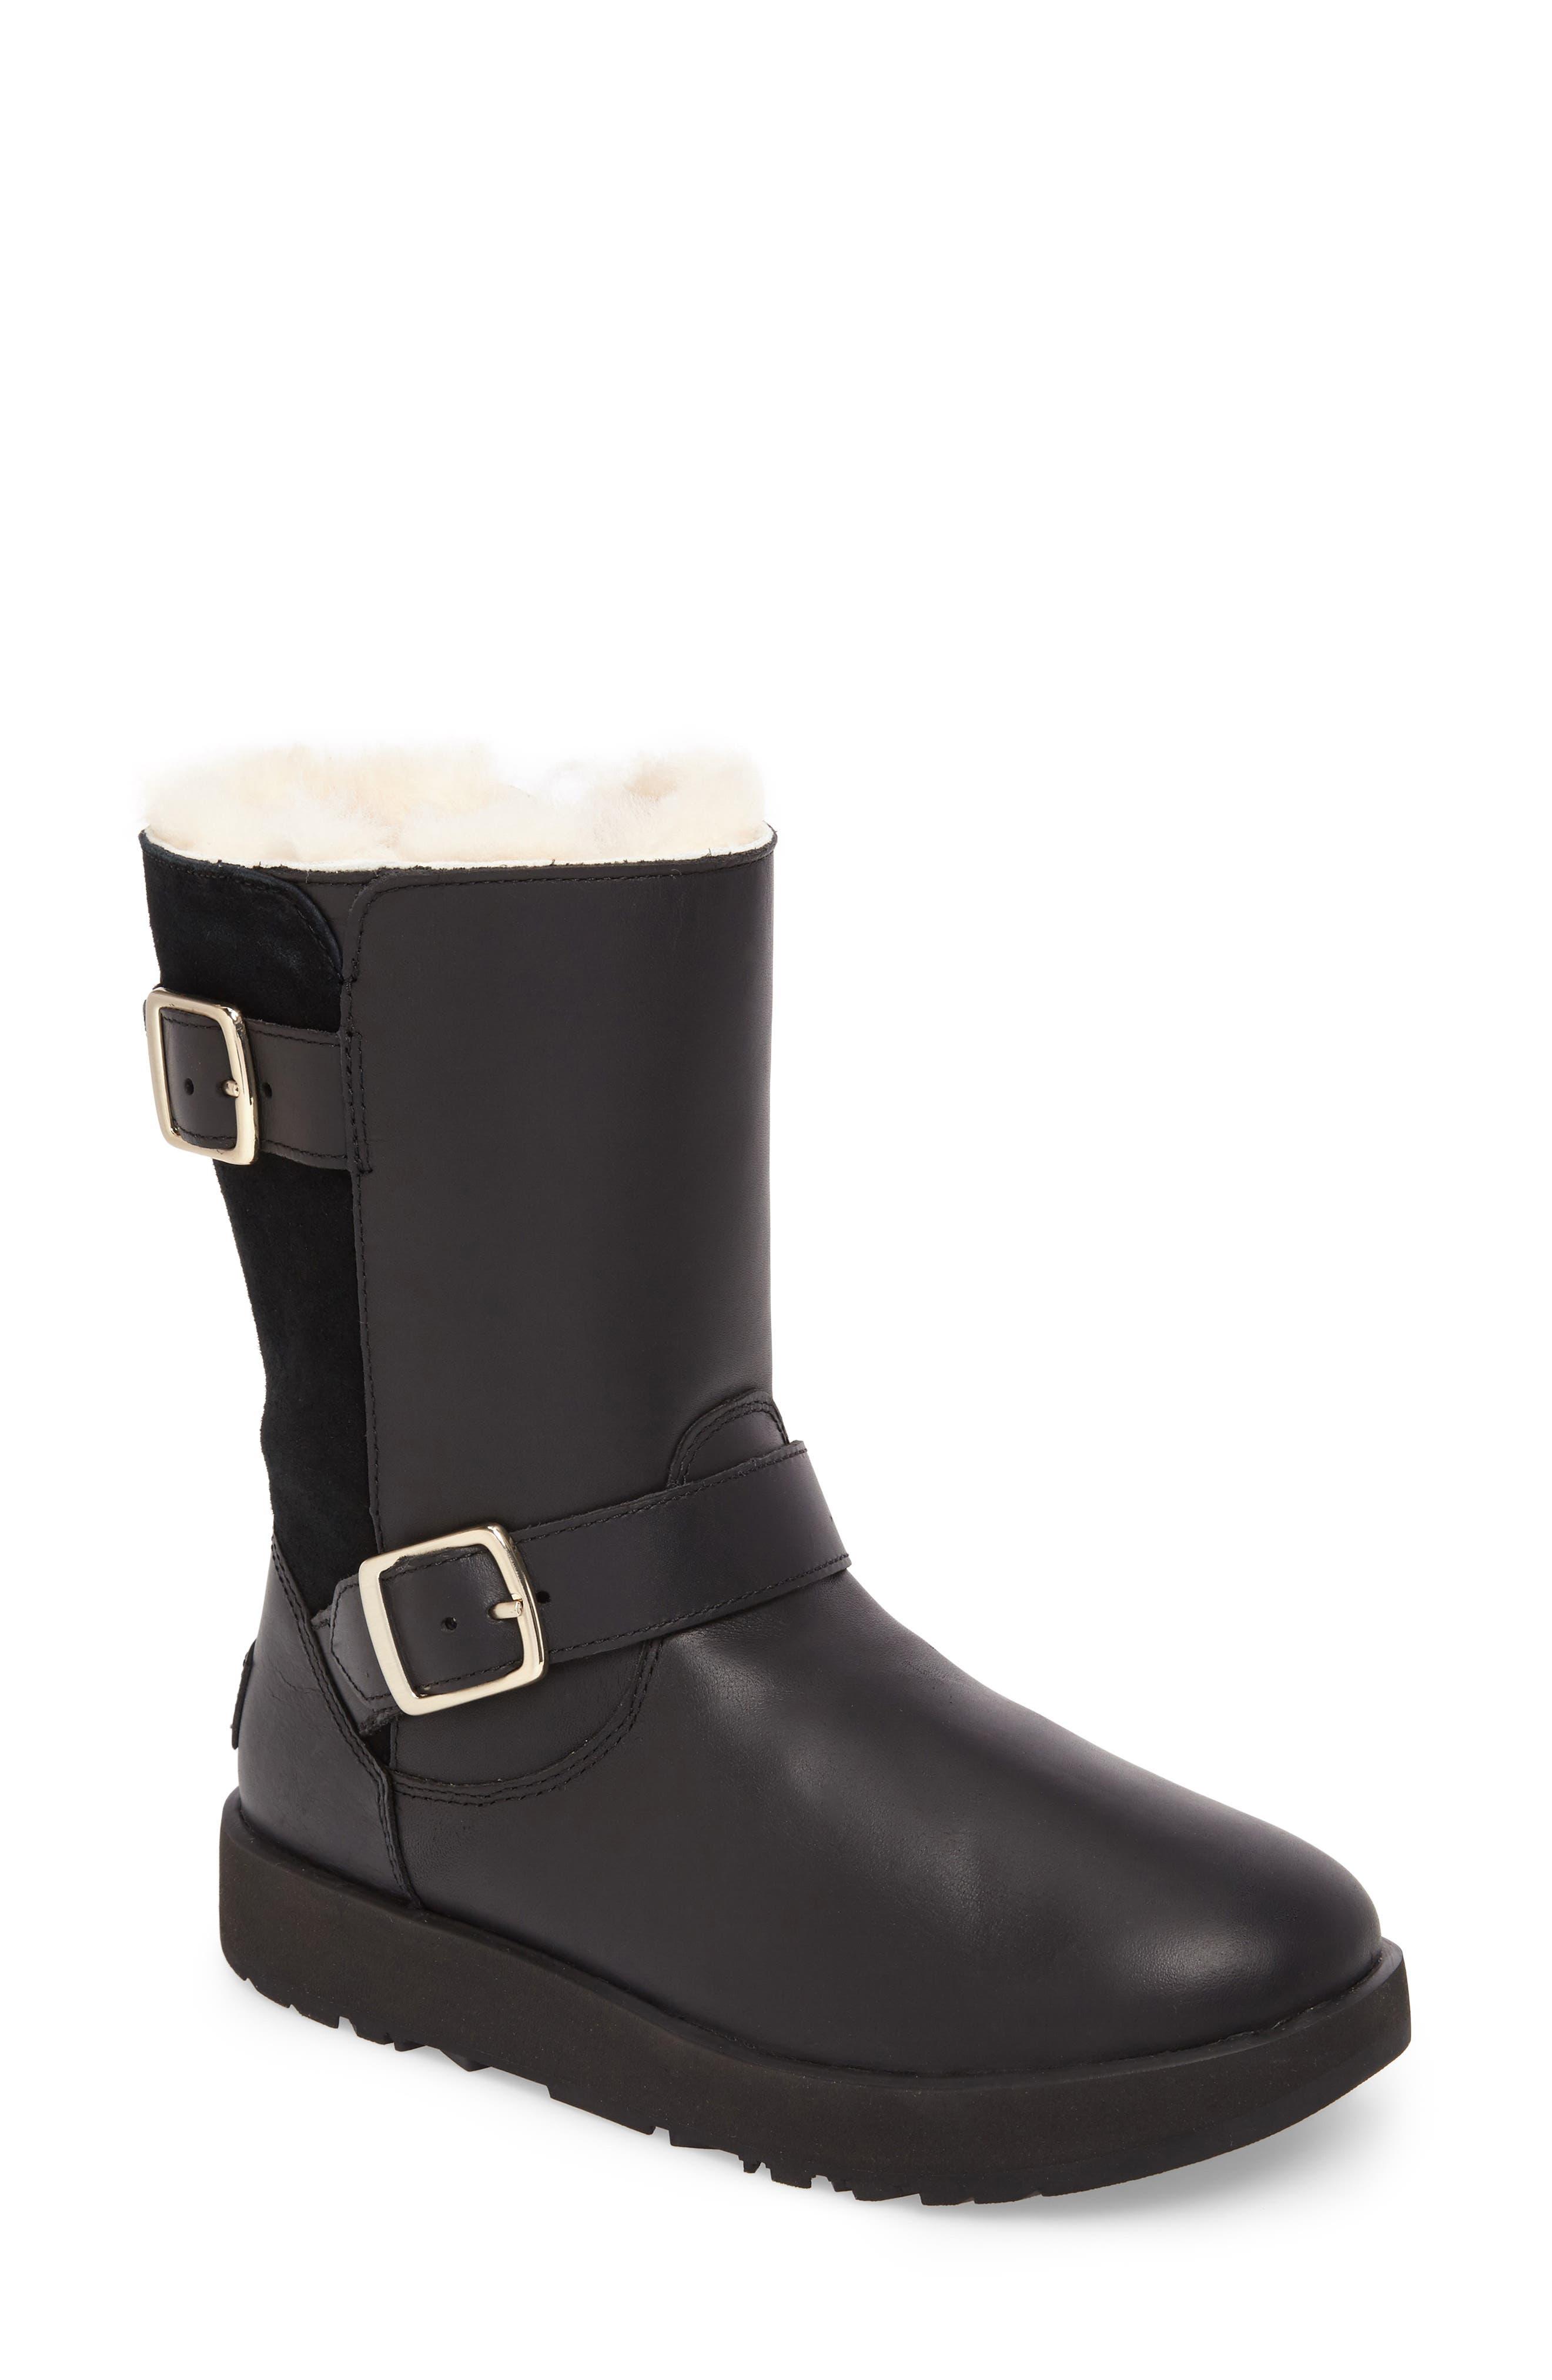 Breida Waterproof Boot,                         Main,                         color, Black Leather